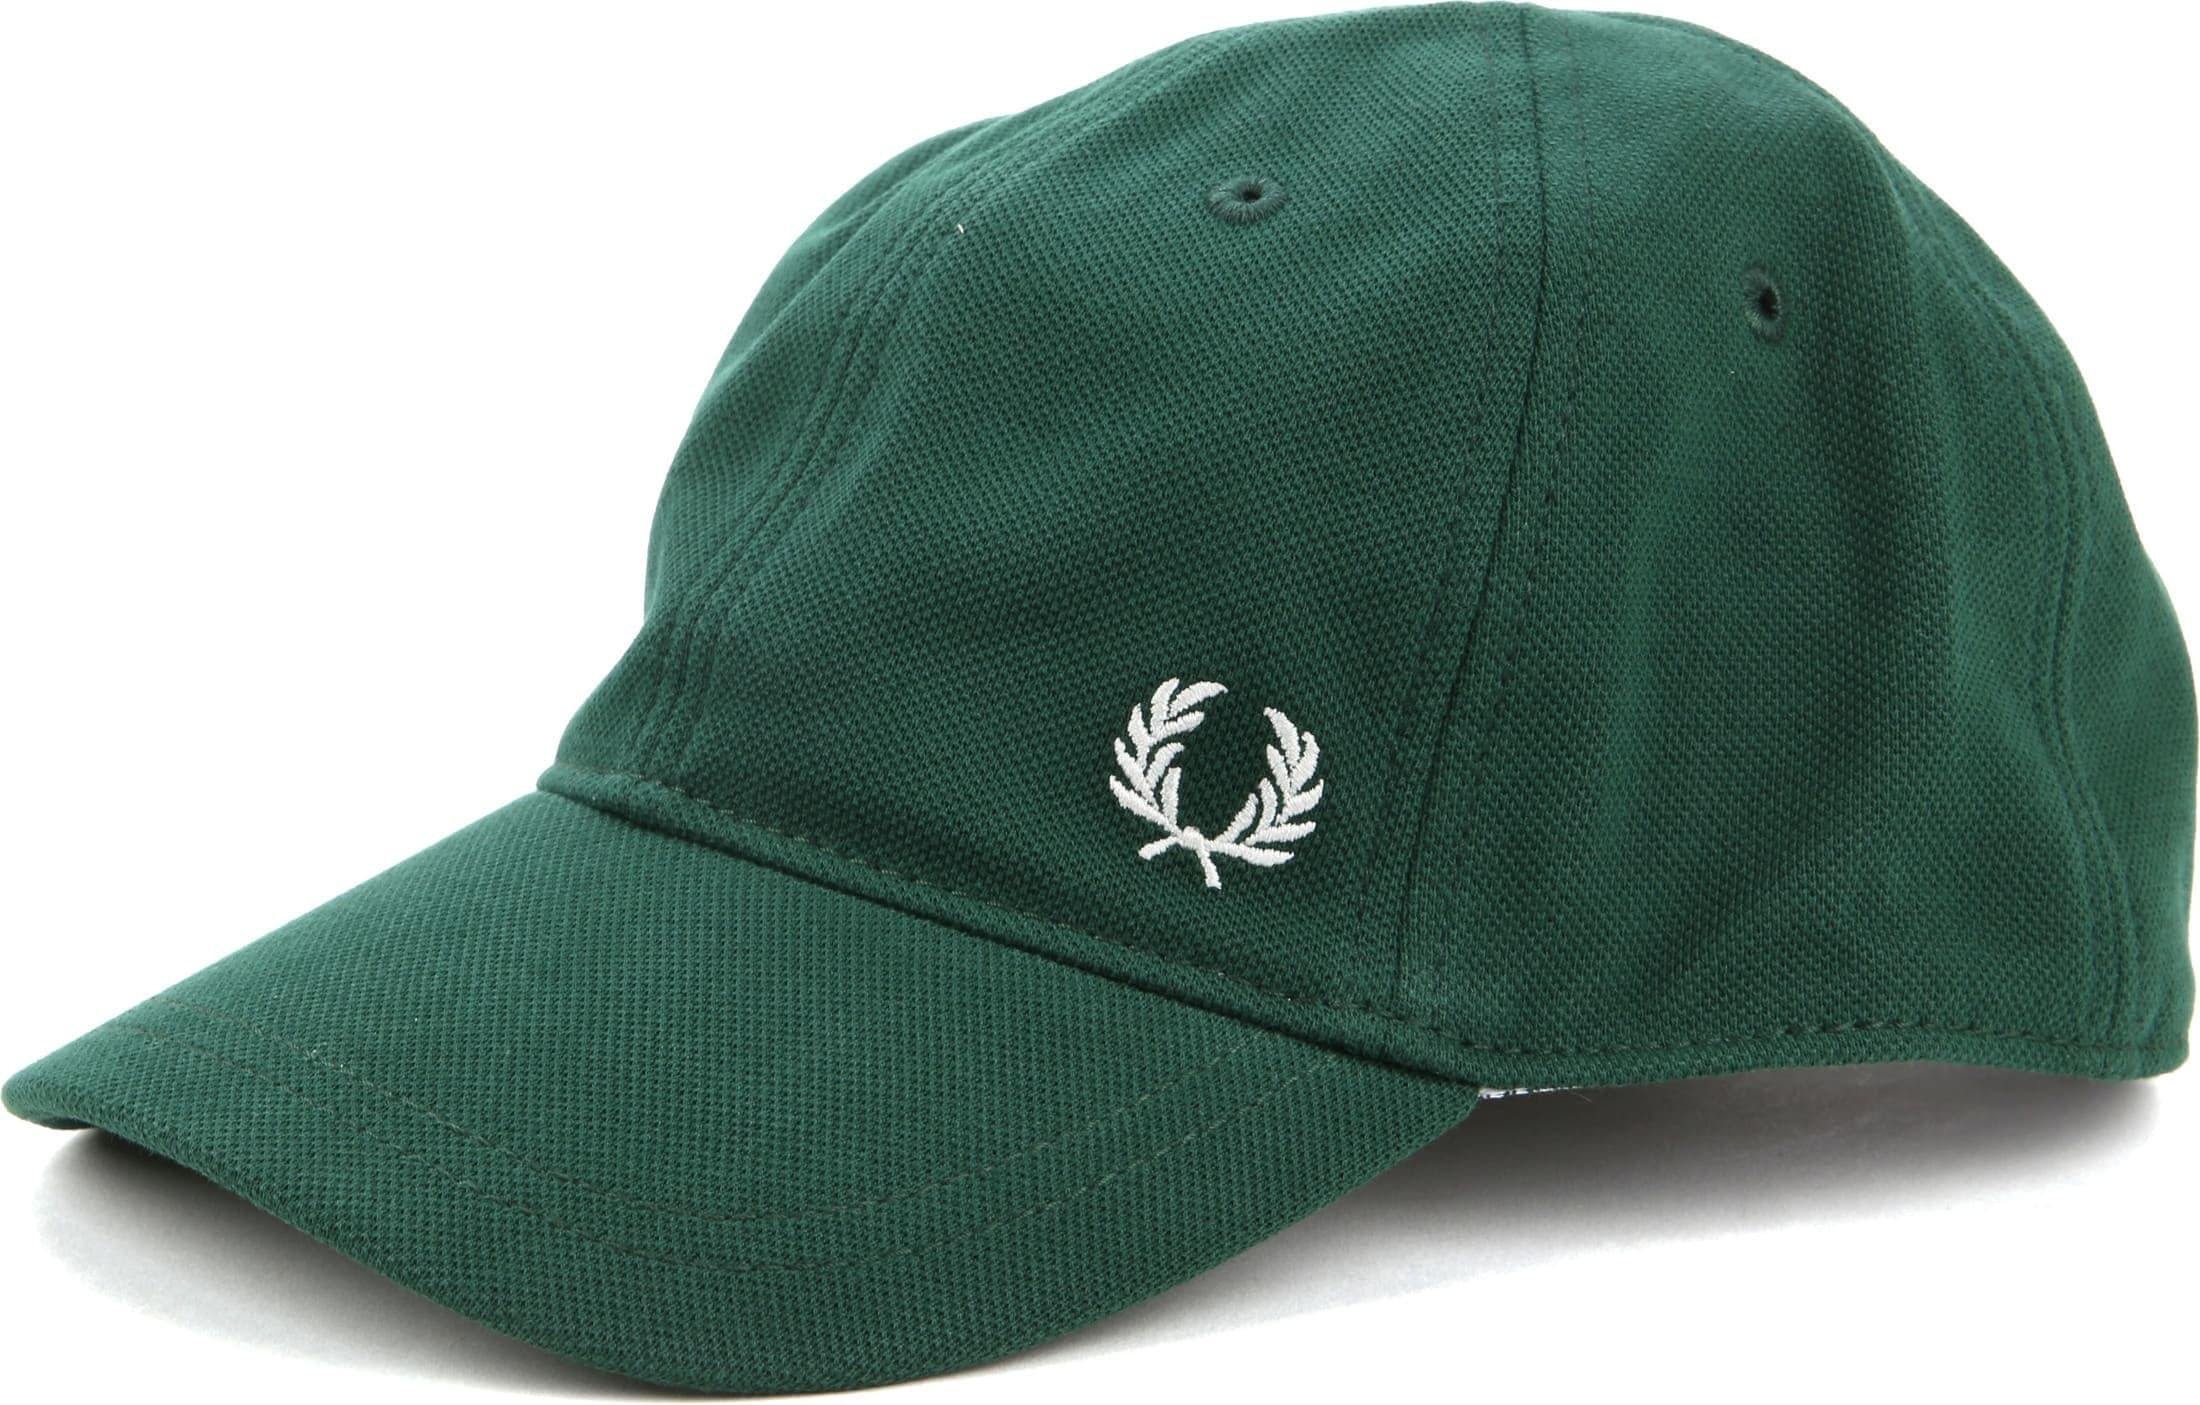 Fred Perry A27 Cap Dark Green HW3650 406 order online  3ed87aa503b4